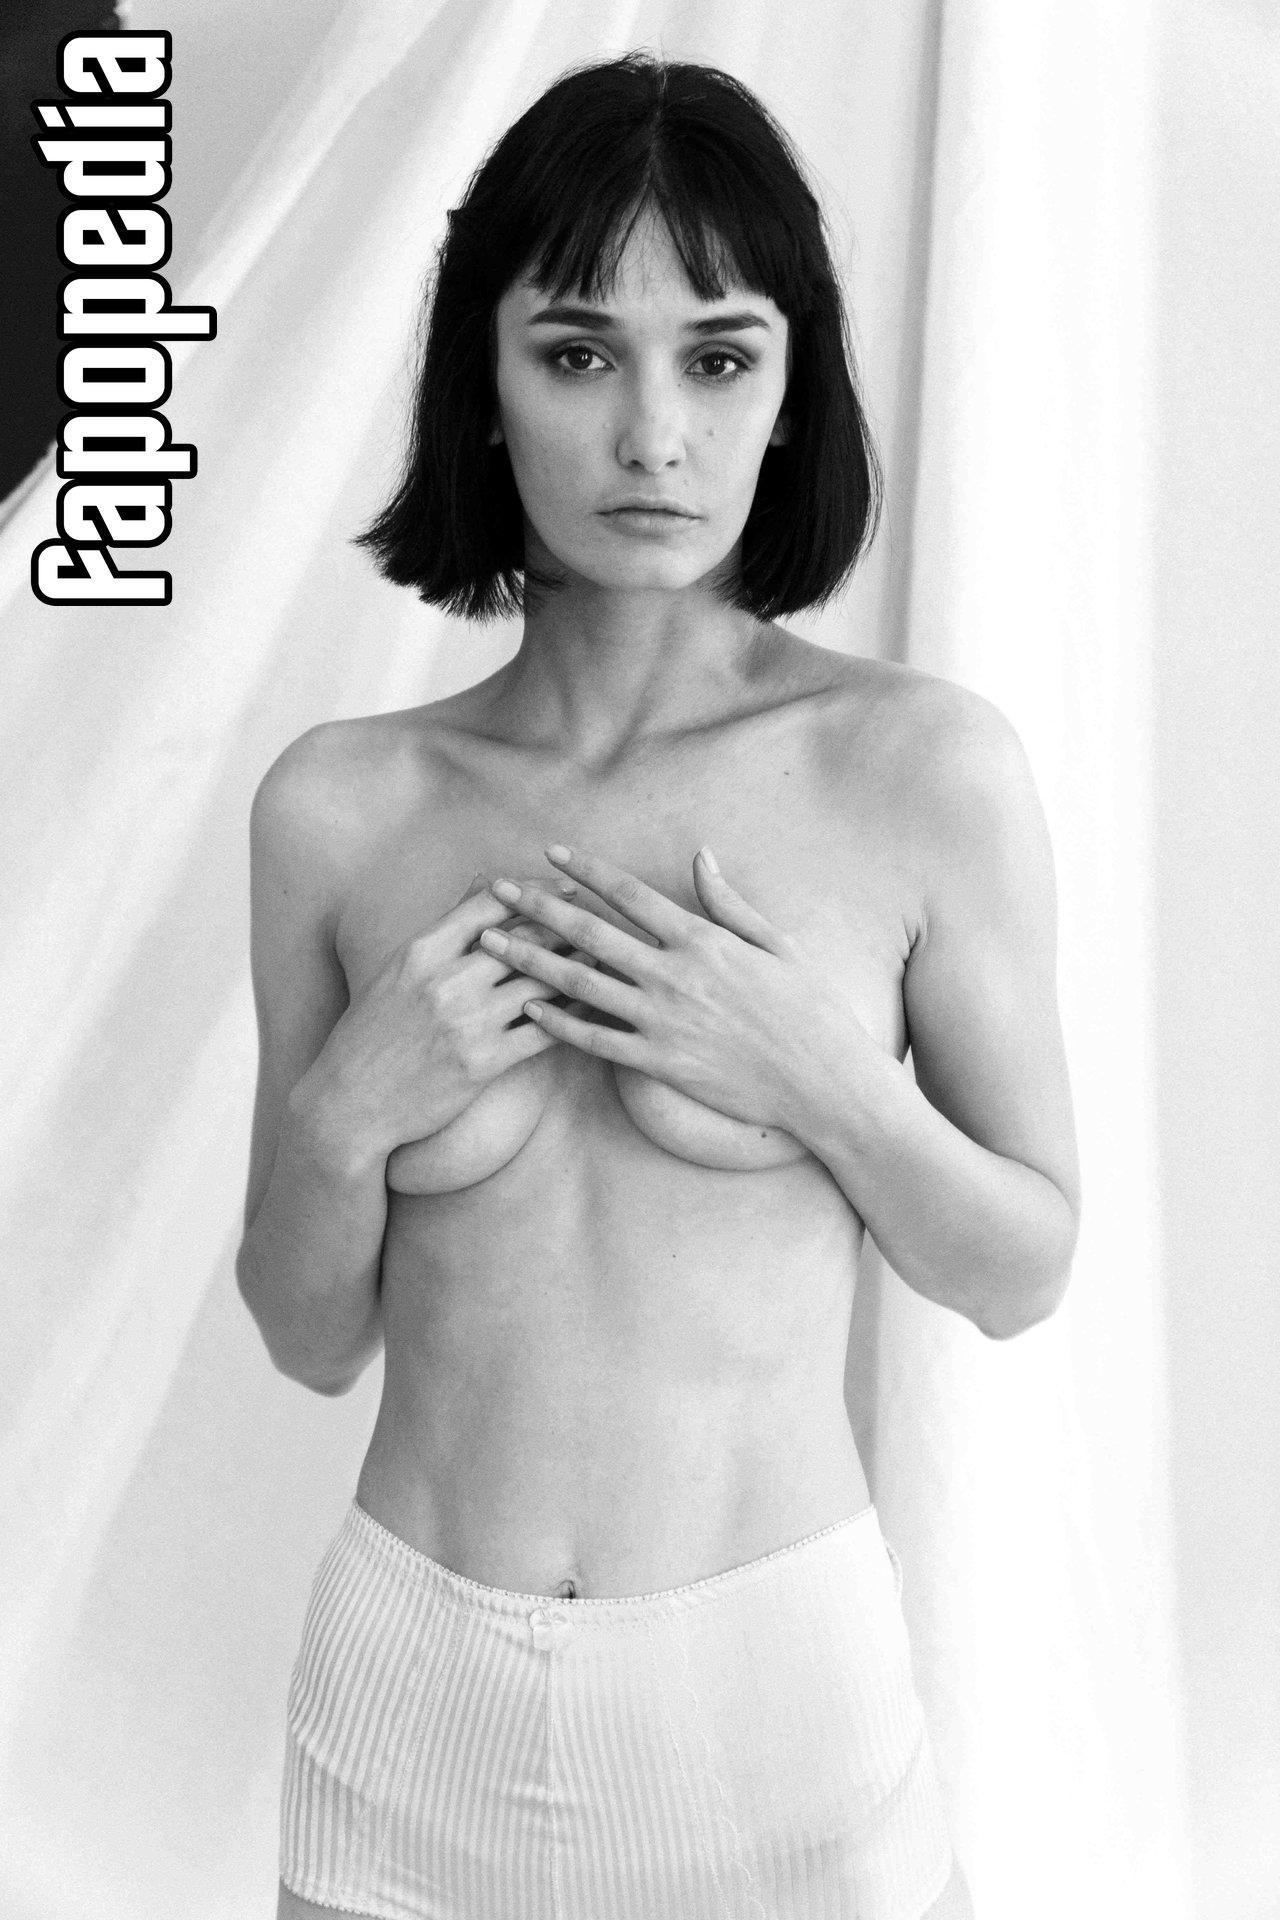 Andrea Abrego Nude Leaks